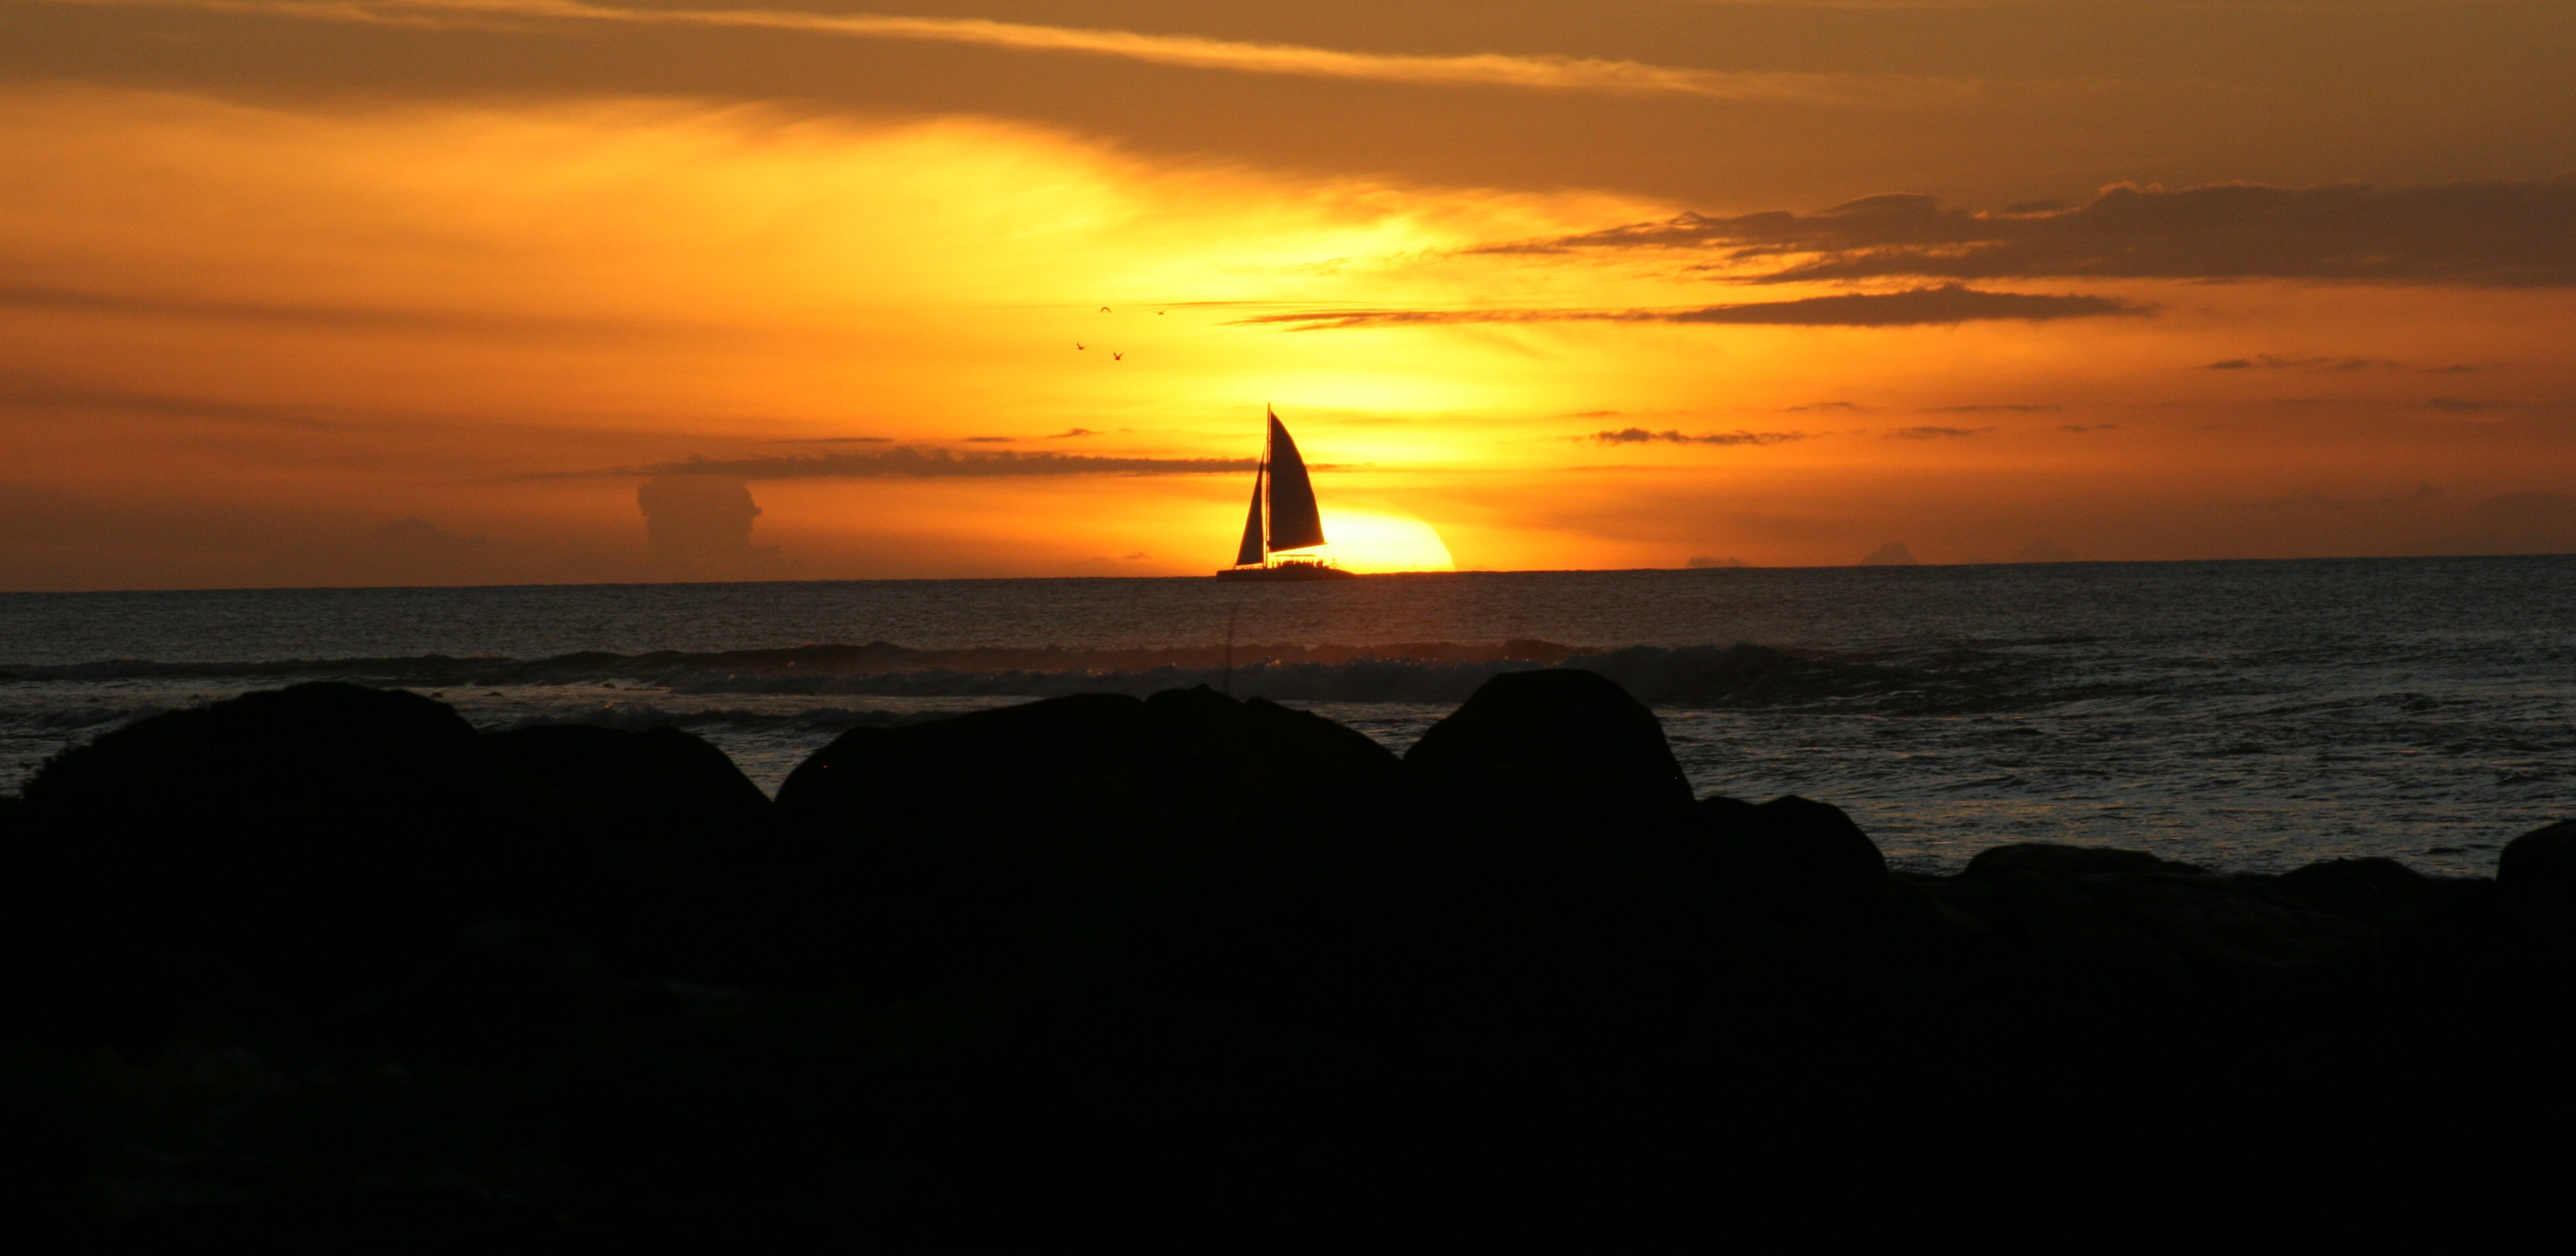 Sunset in Tamarin Mauritius